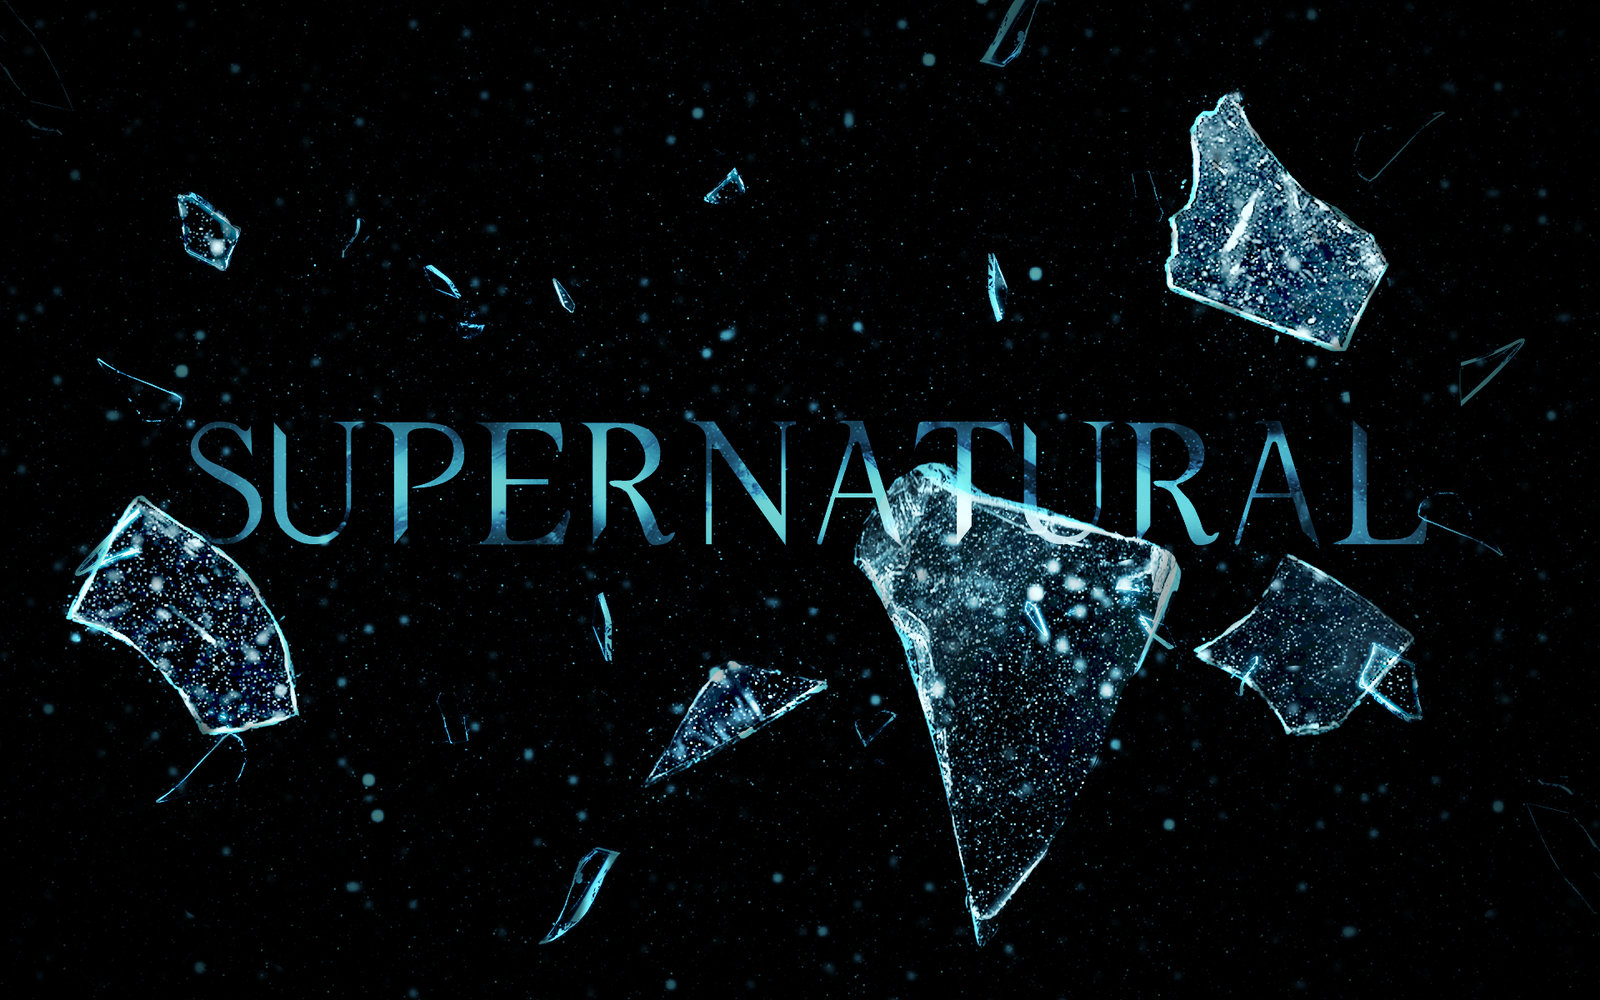 supernatural_season_6_hd_by_inickeon-d2zs4k3.jpg